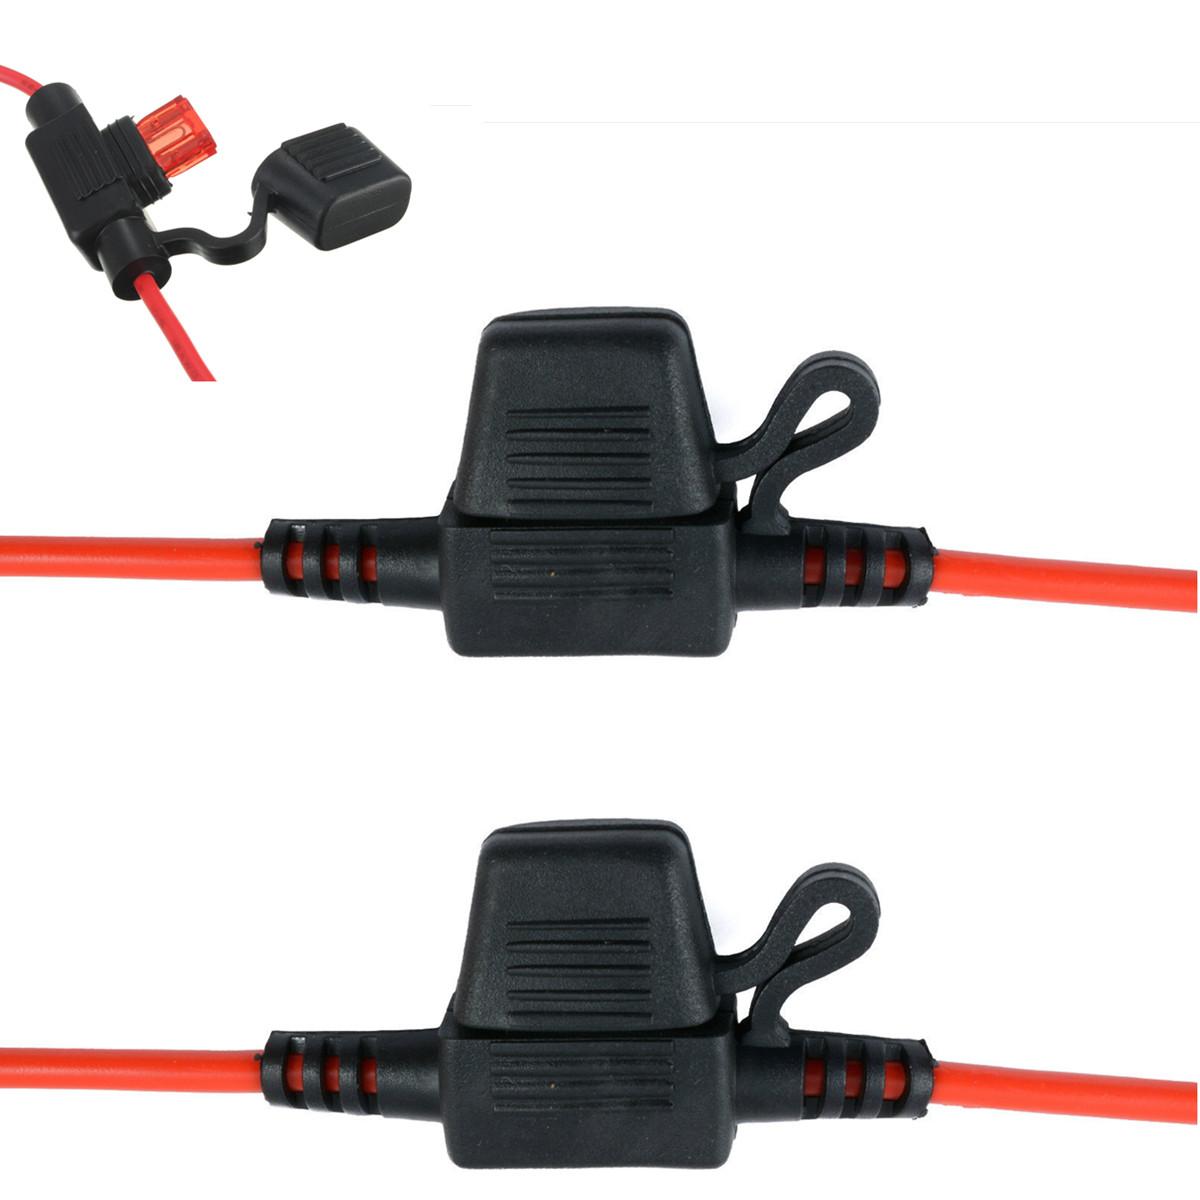 fuse block box holder atc blade waterproof in line fuse